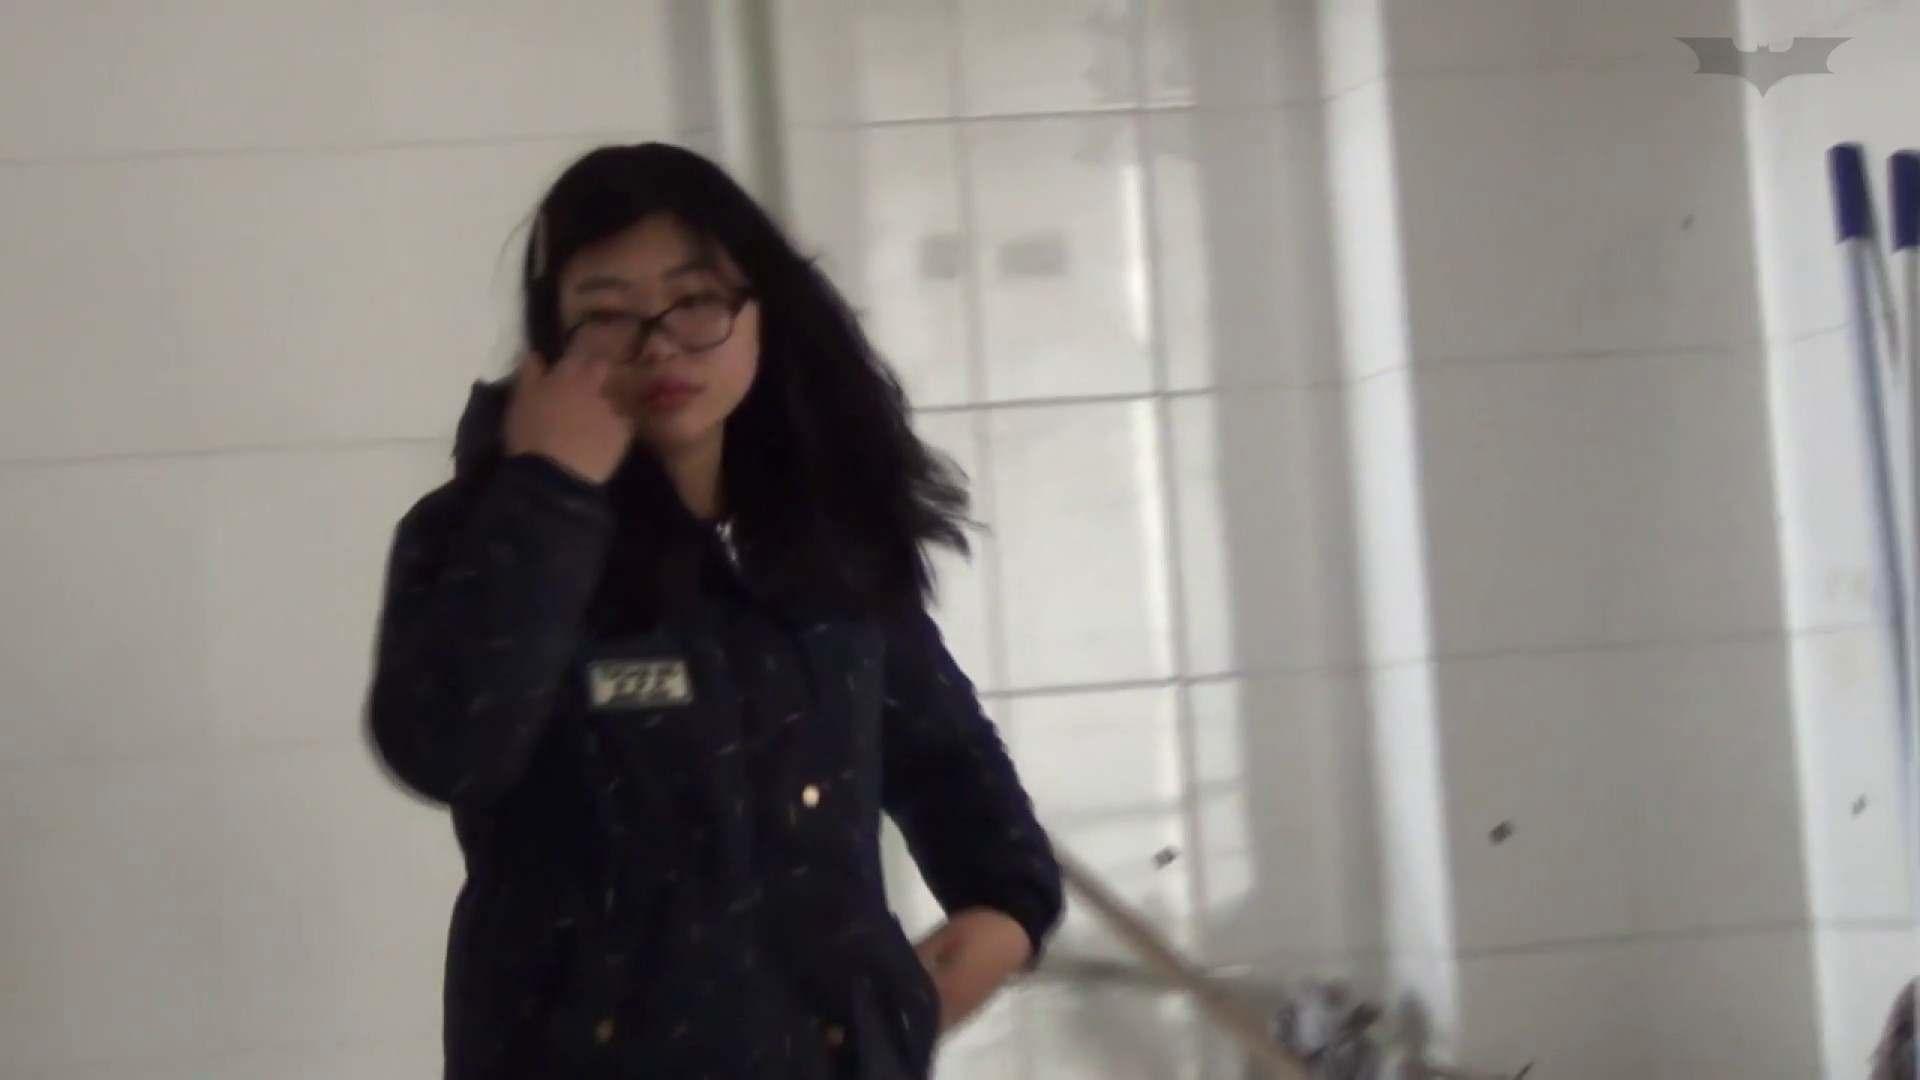 JD盗撮 美女の洗面所の秘密 Vol.47 盗撮で悶絶 オメコ動画キャプチャ 108画像 6